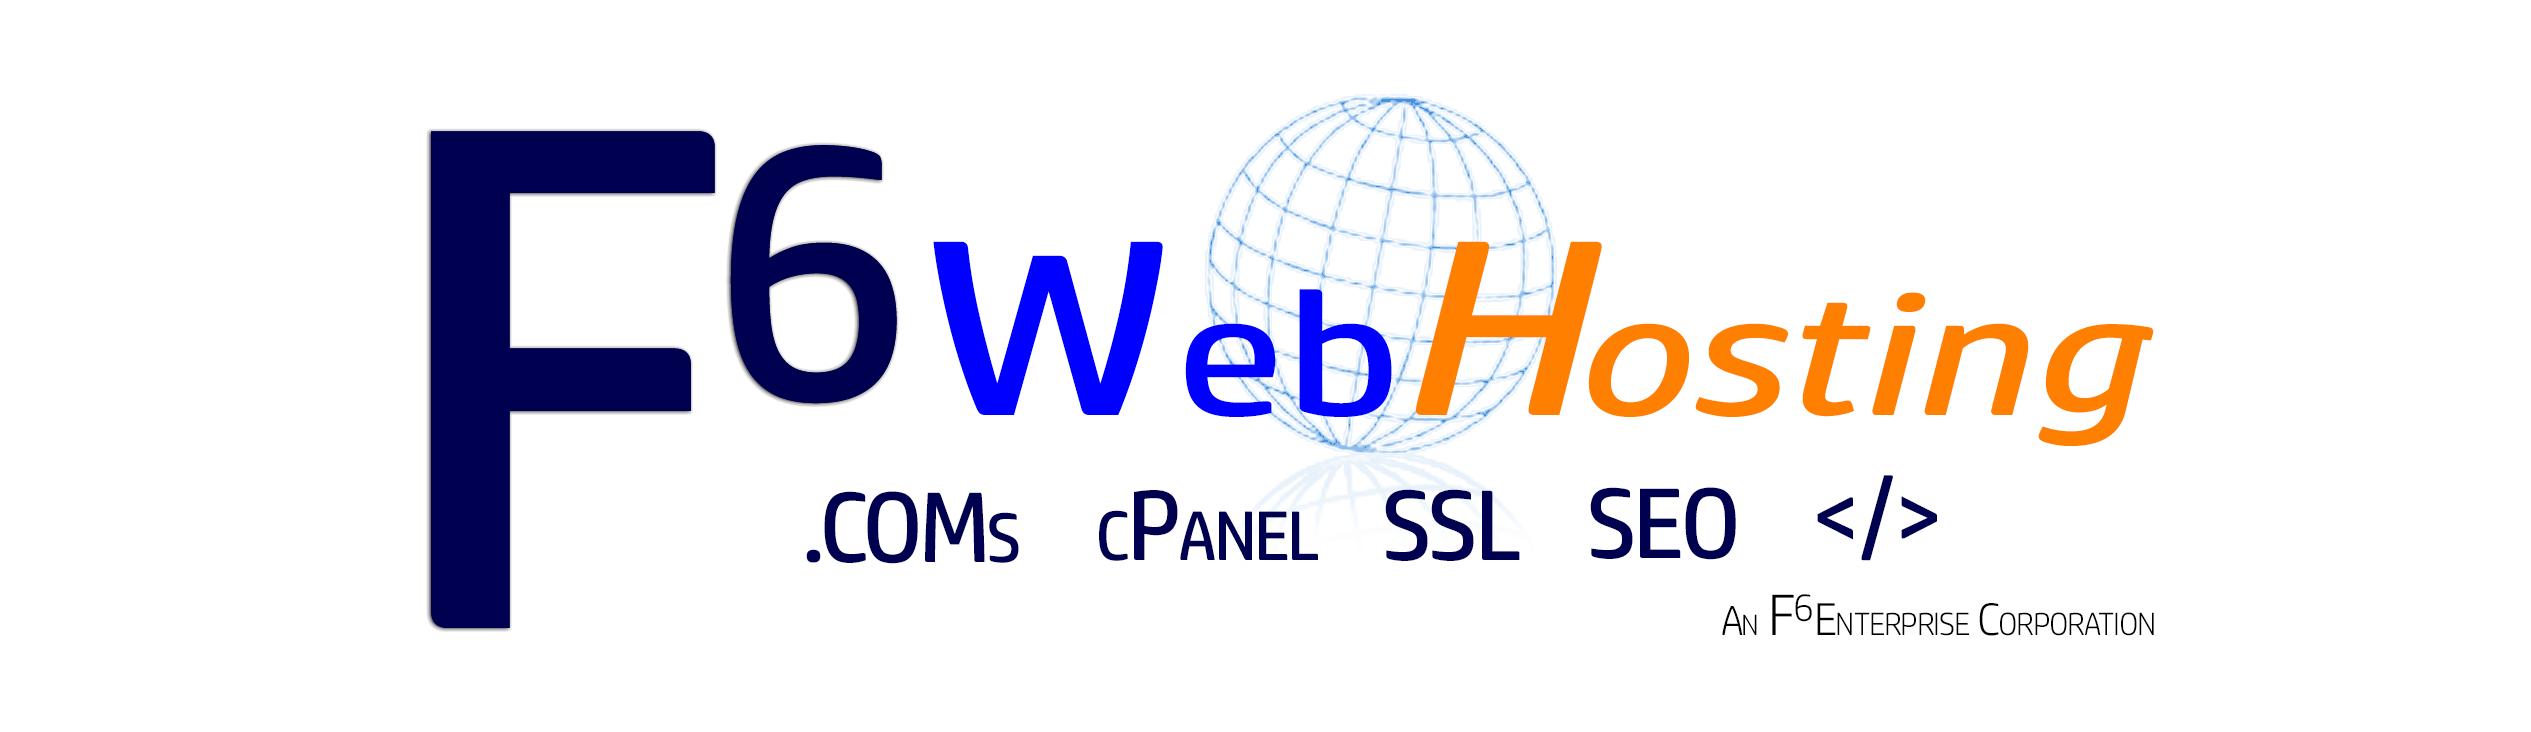 F6 WebHosting